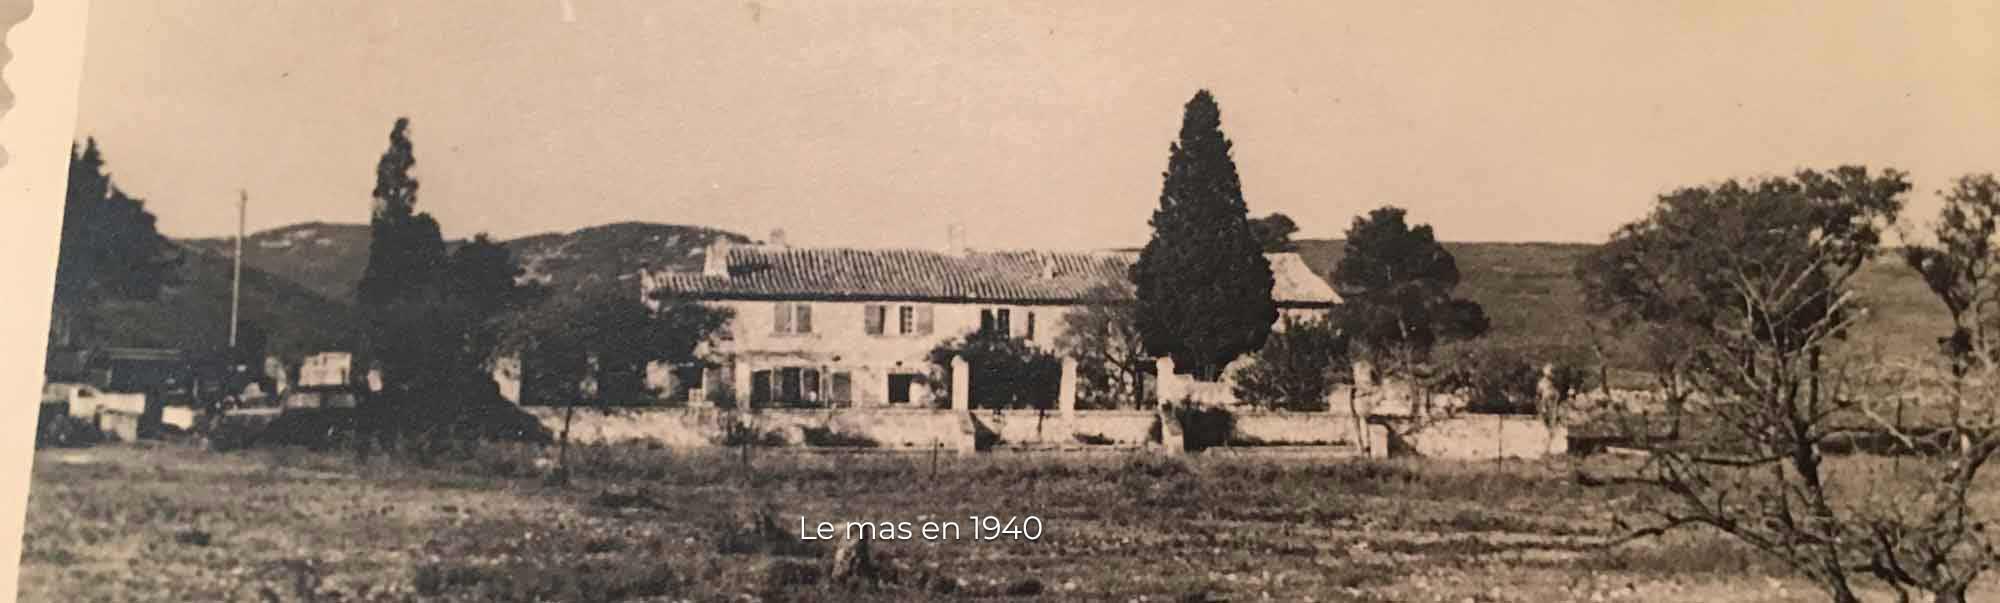 histoire-mas1